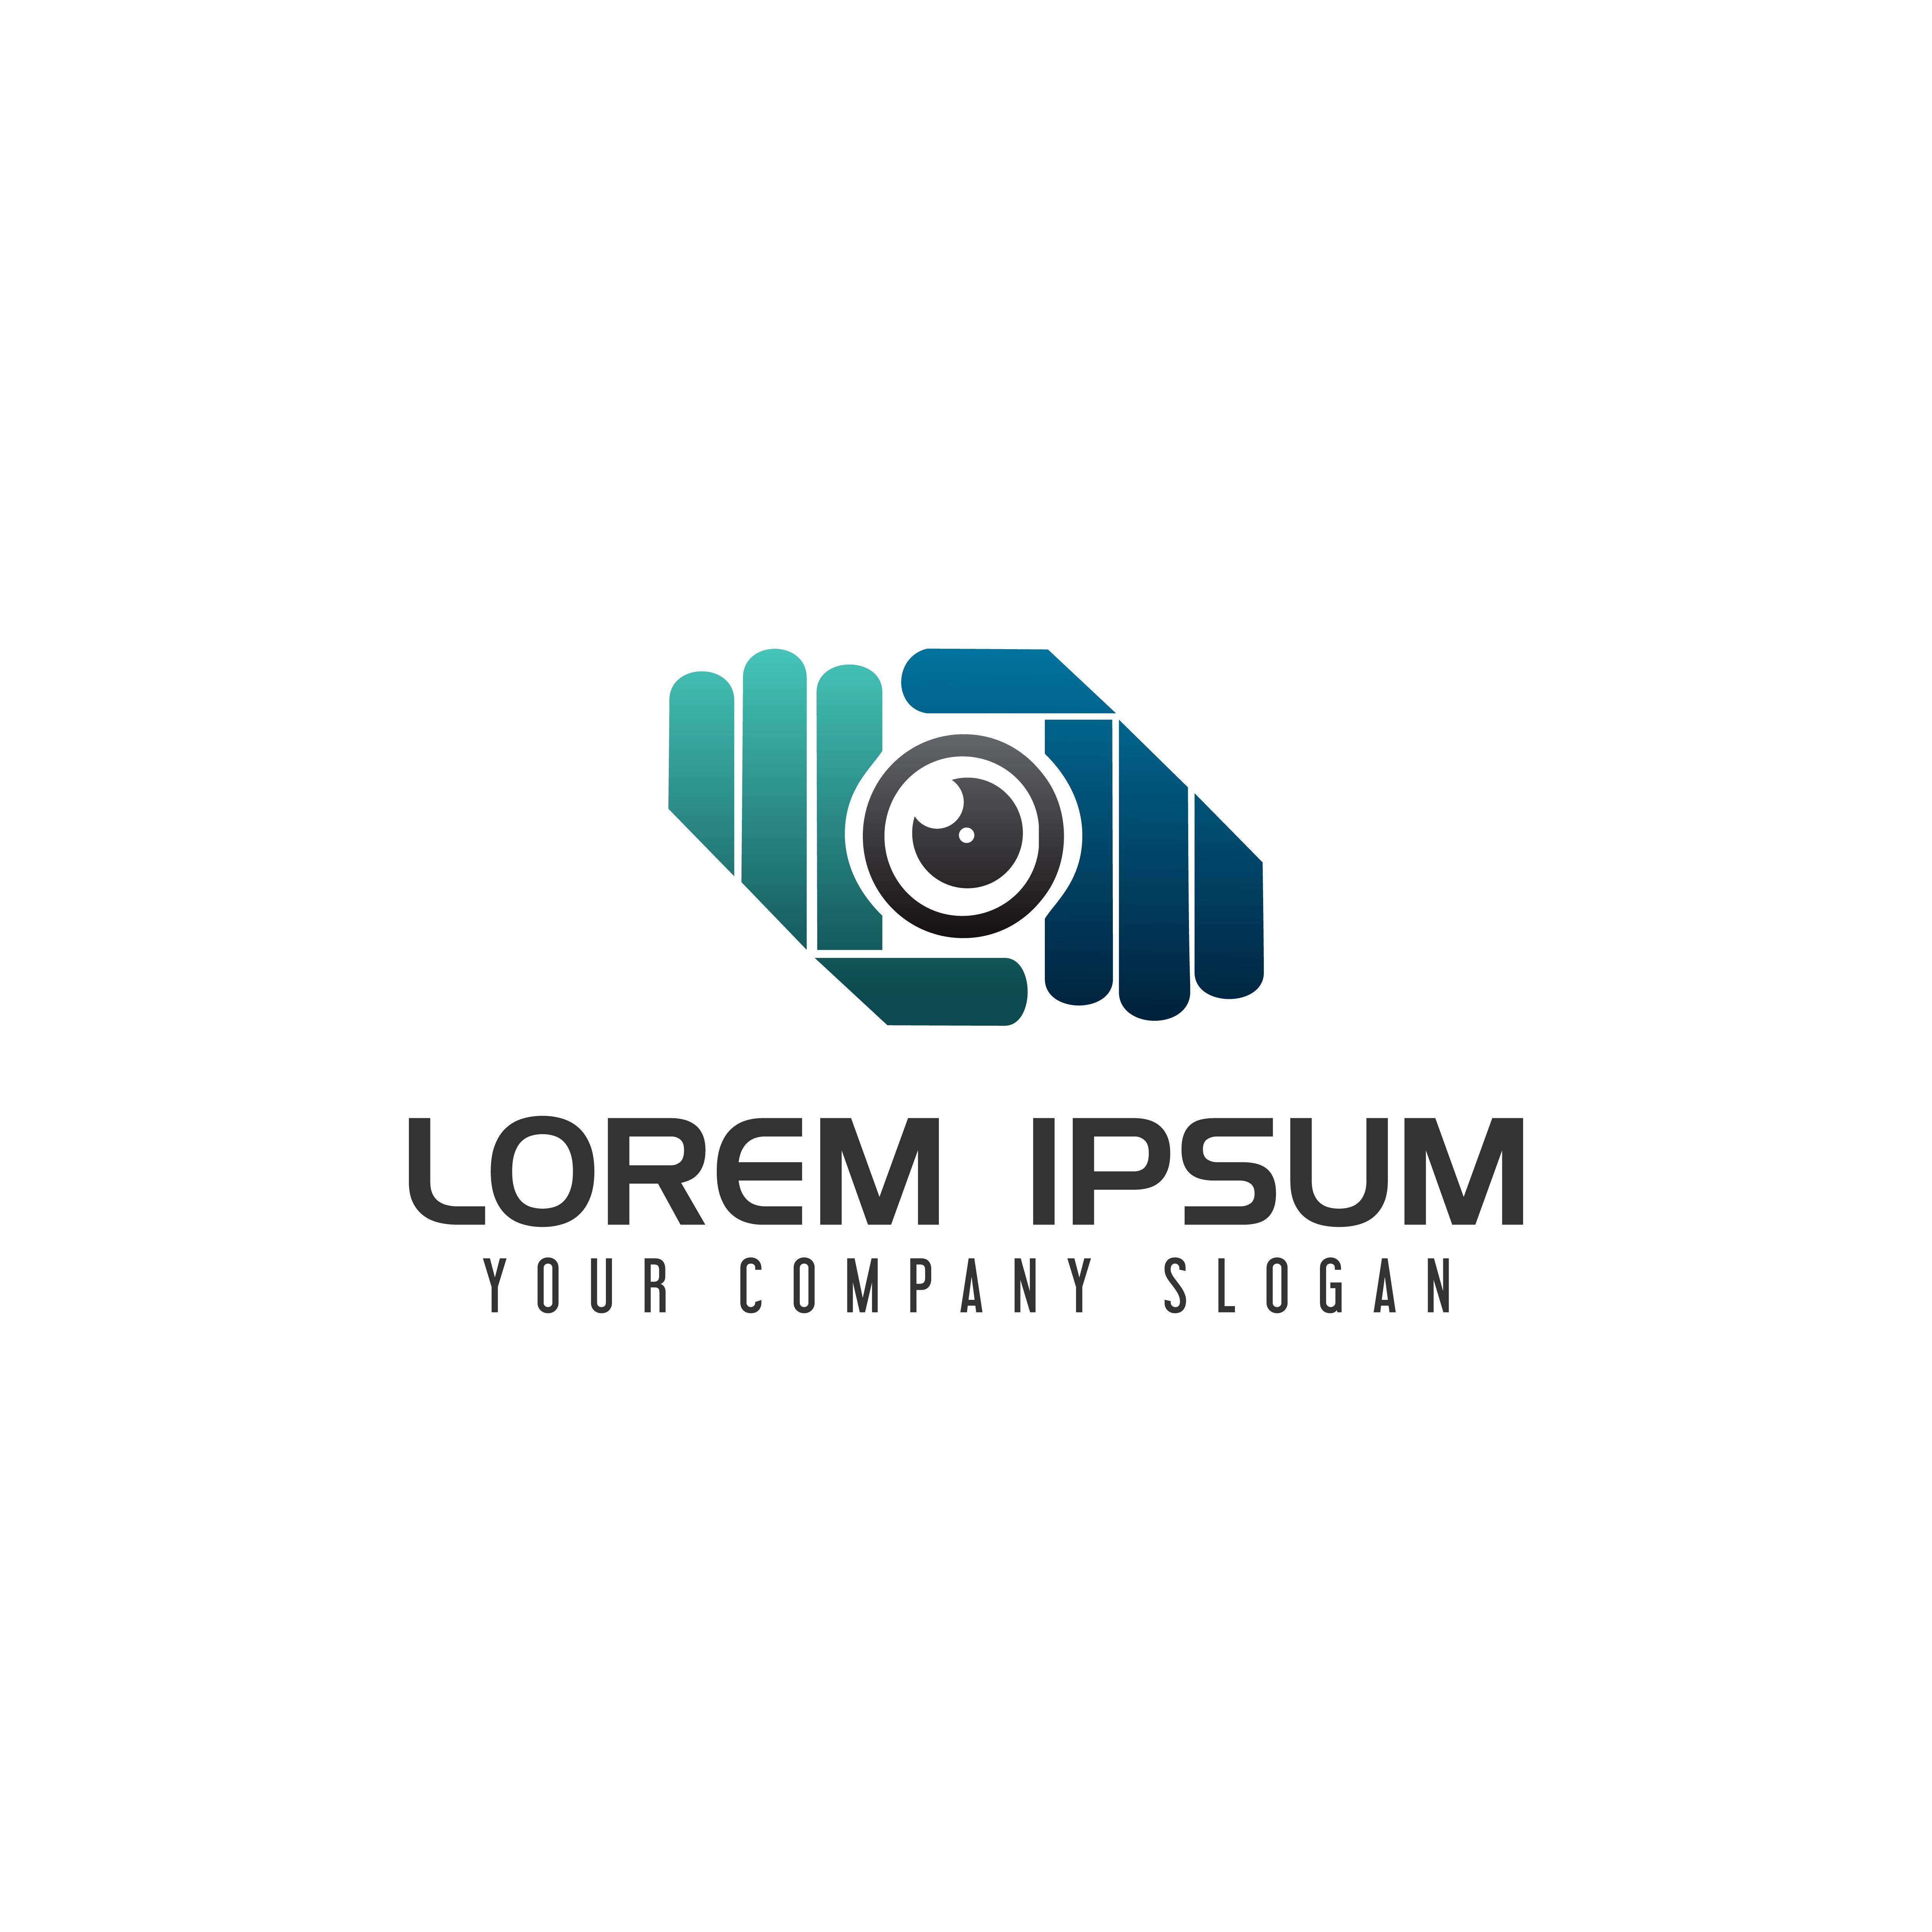 Hand Camera Lens Photography Logo Design Concept Template Download Free Vectors Clipart Graphics Vector Art